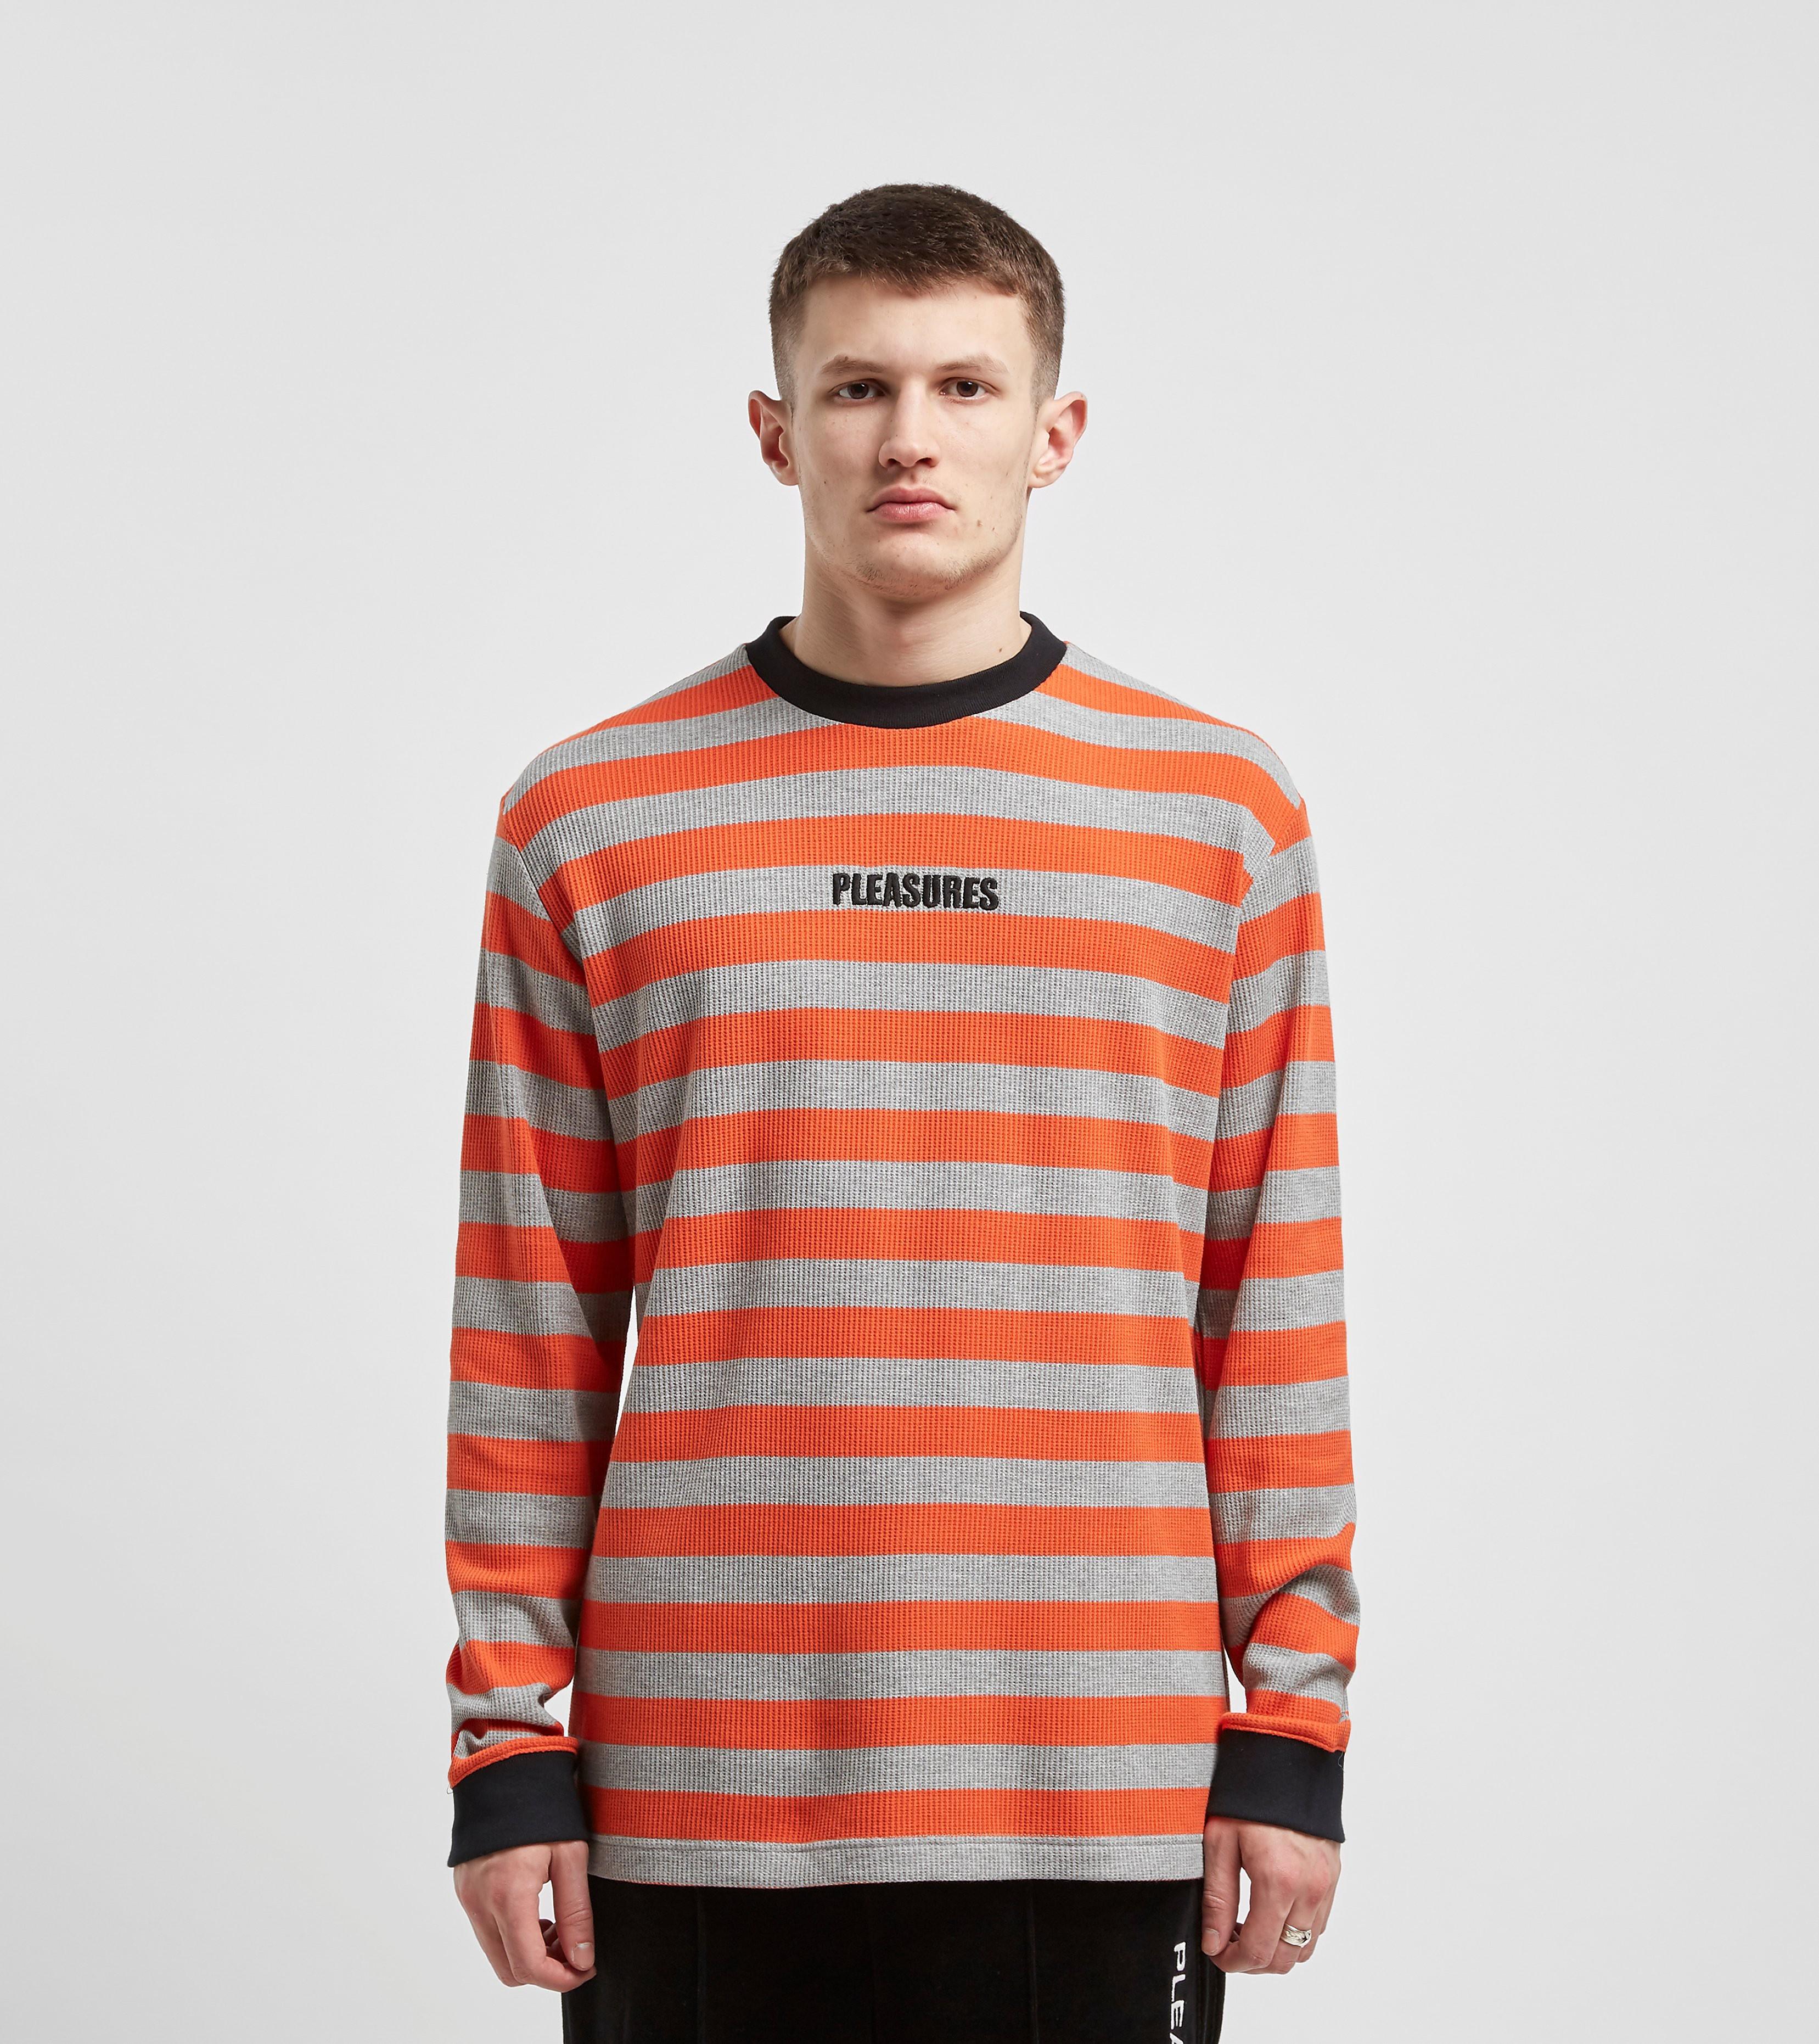 PLEASURES Waffle Stripe Long Sleeve T-Shirt